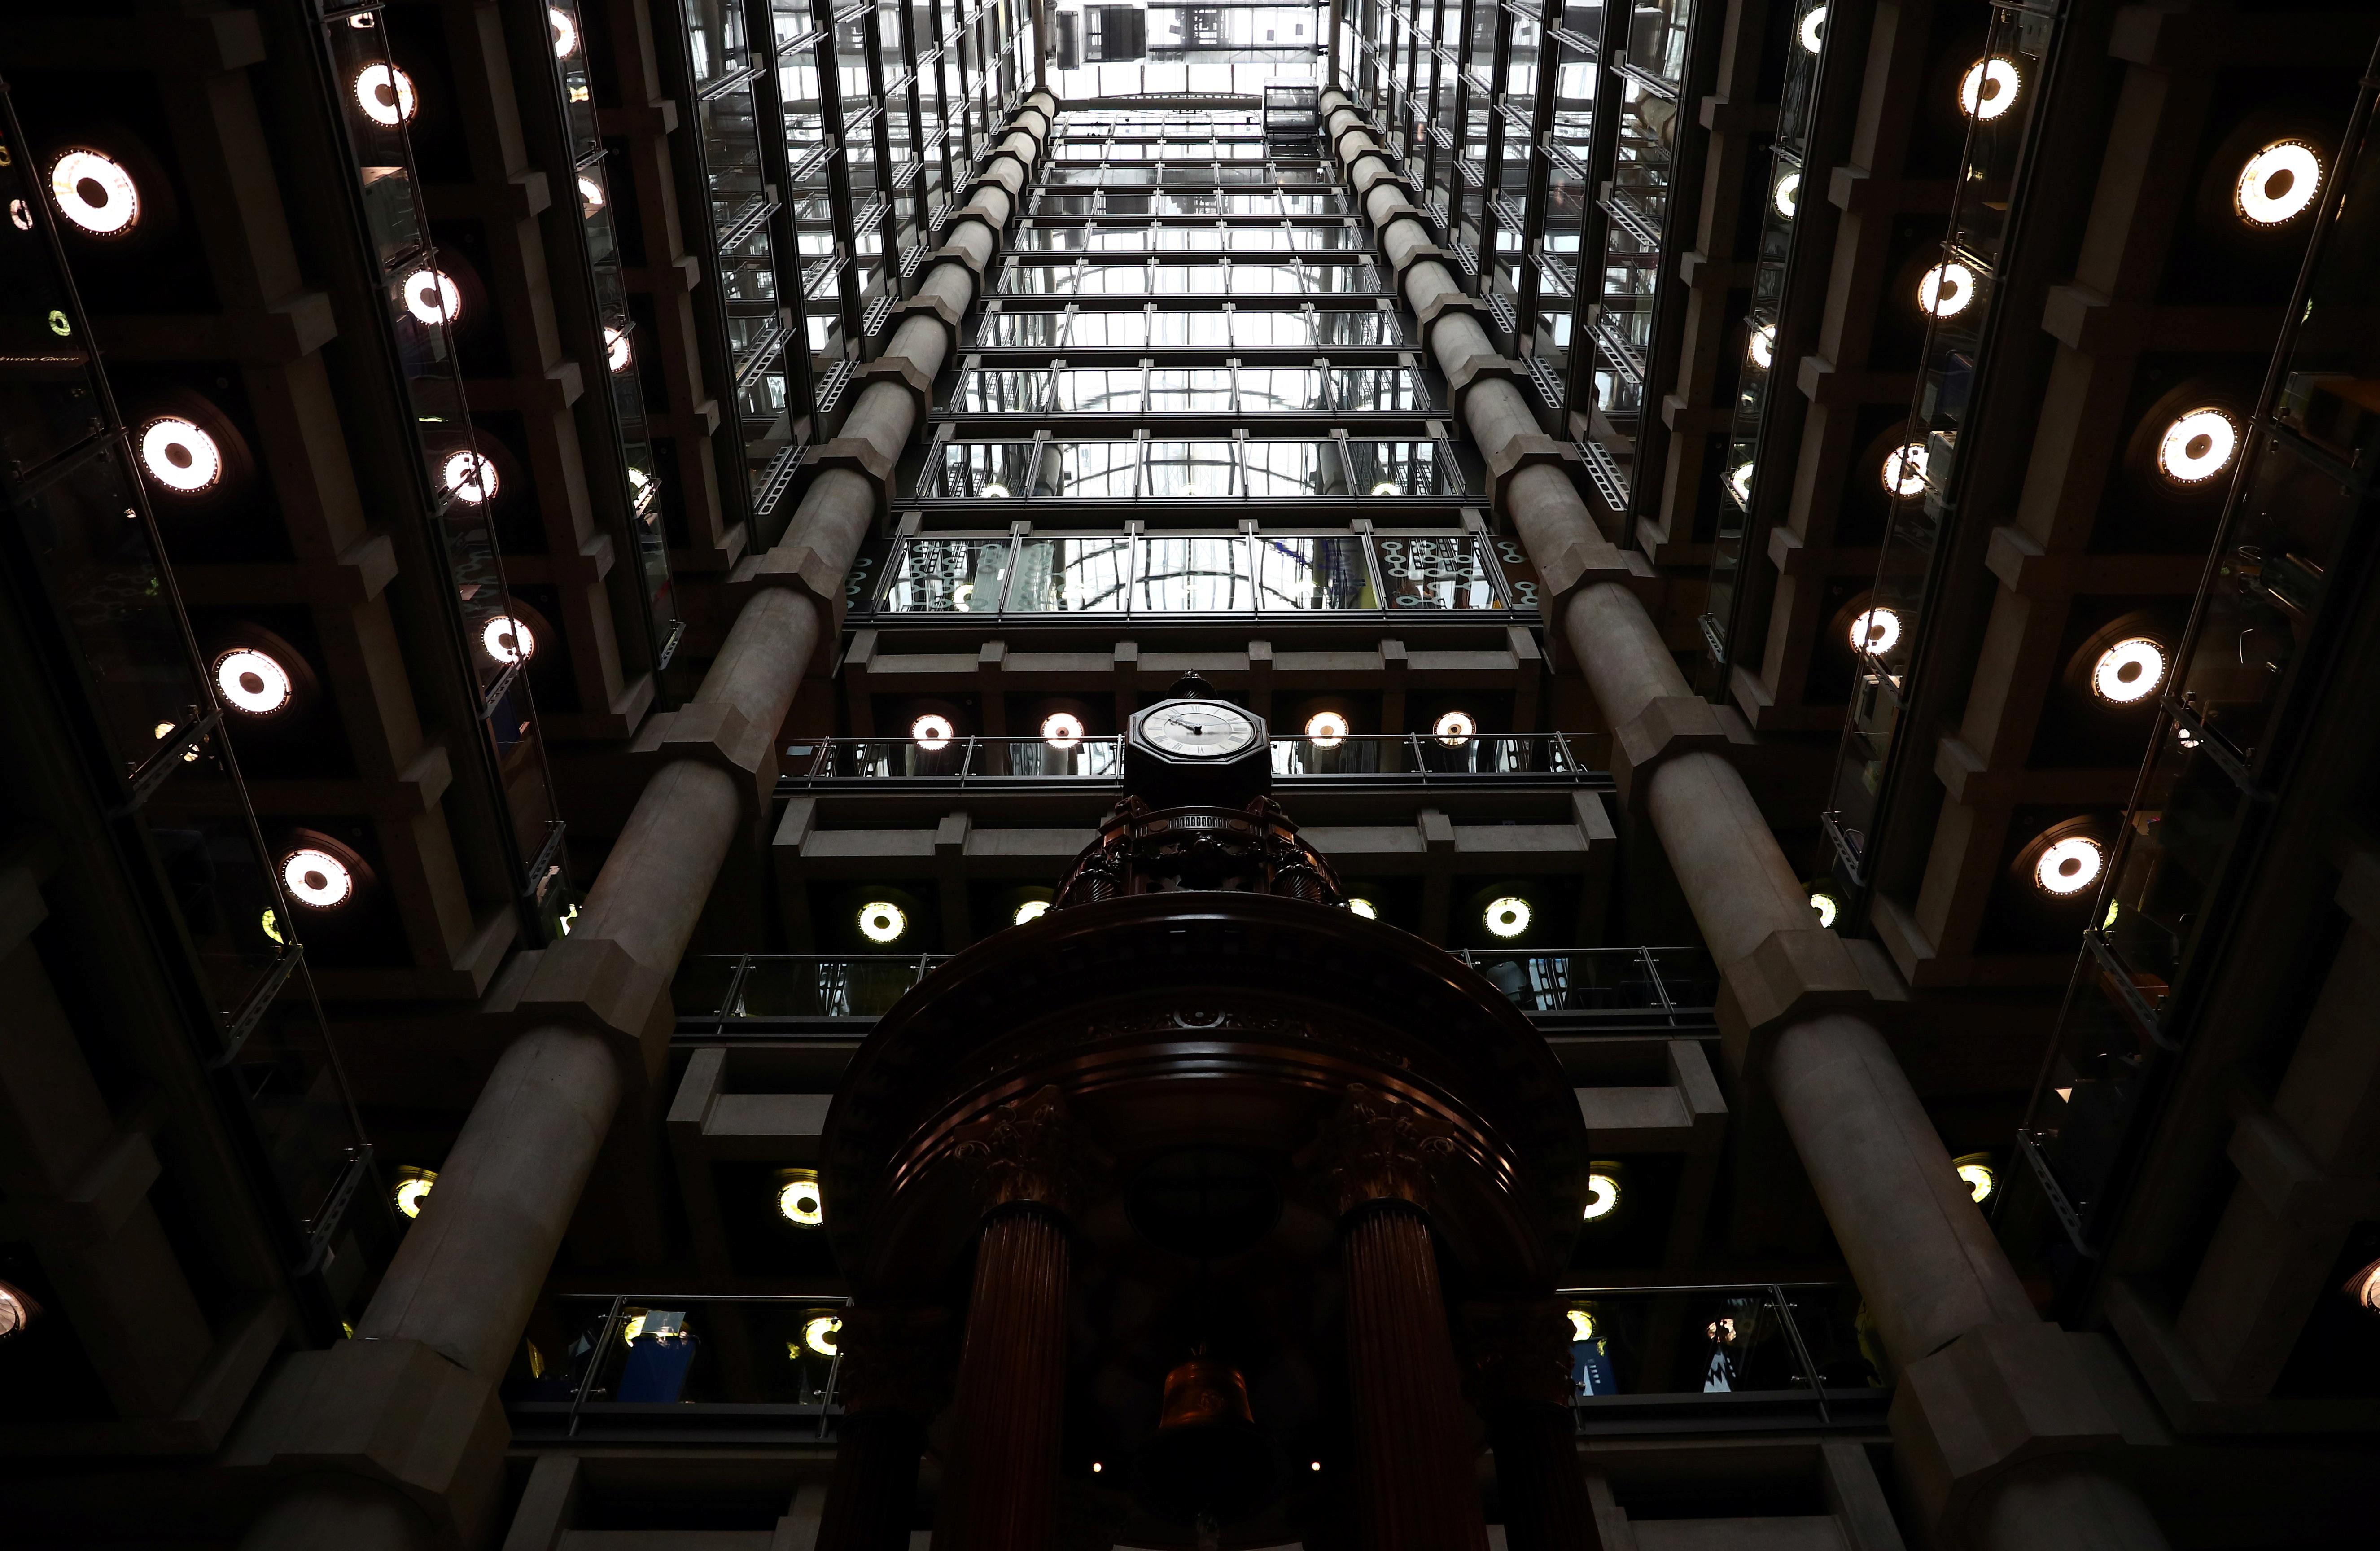 Lloyd 's of London 건물의 내부는 2019 년 4 월 16 일 영국 런던의 City of London 금융 지구에서 볼 수 있습니다. 사진 촬영 : 2019 년 4 월 16 일. REUTERS / Hannah McKay-RC13117E4A60